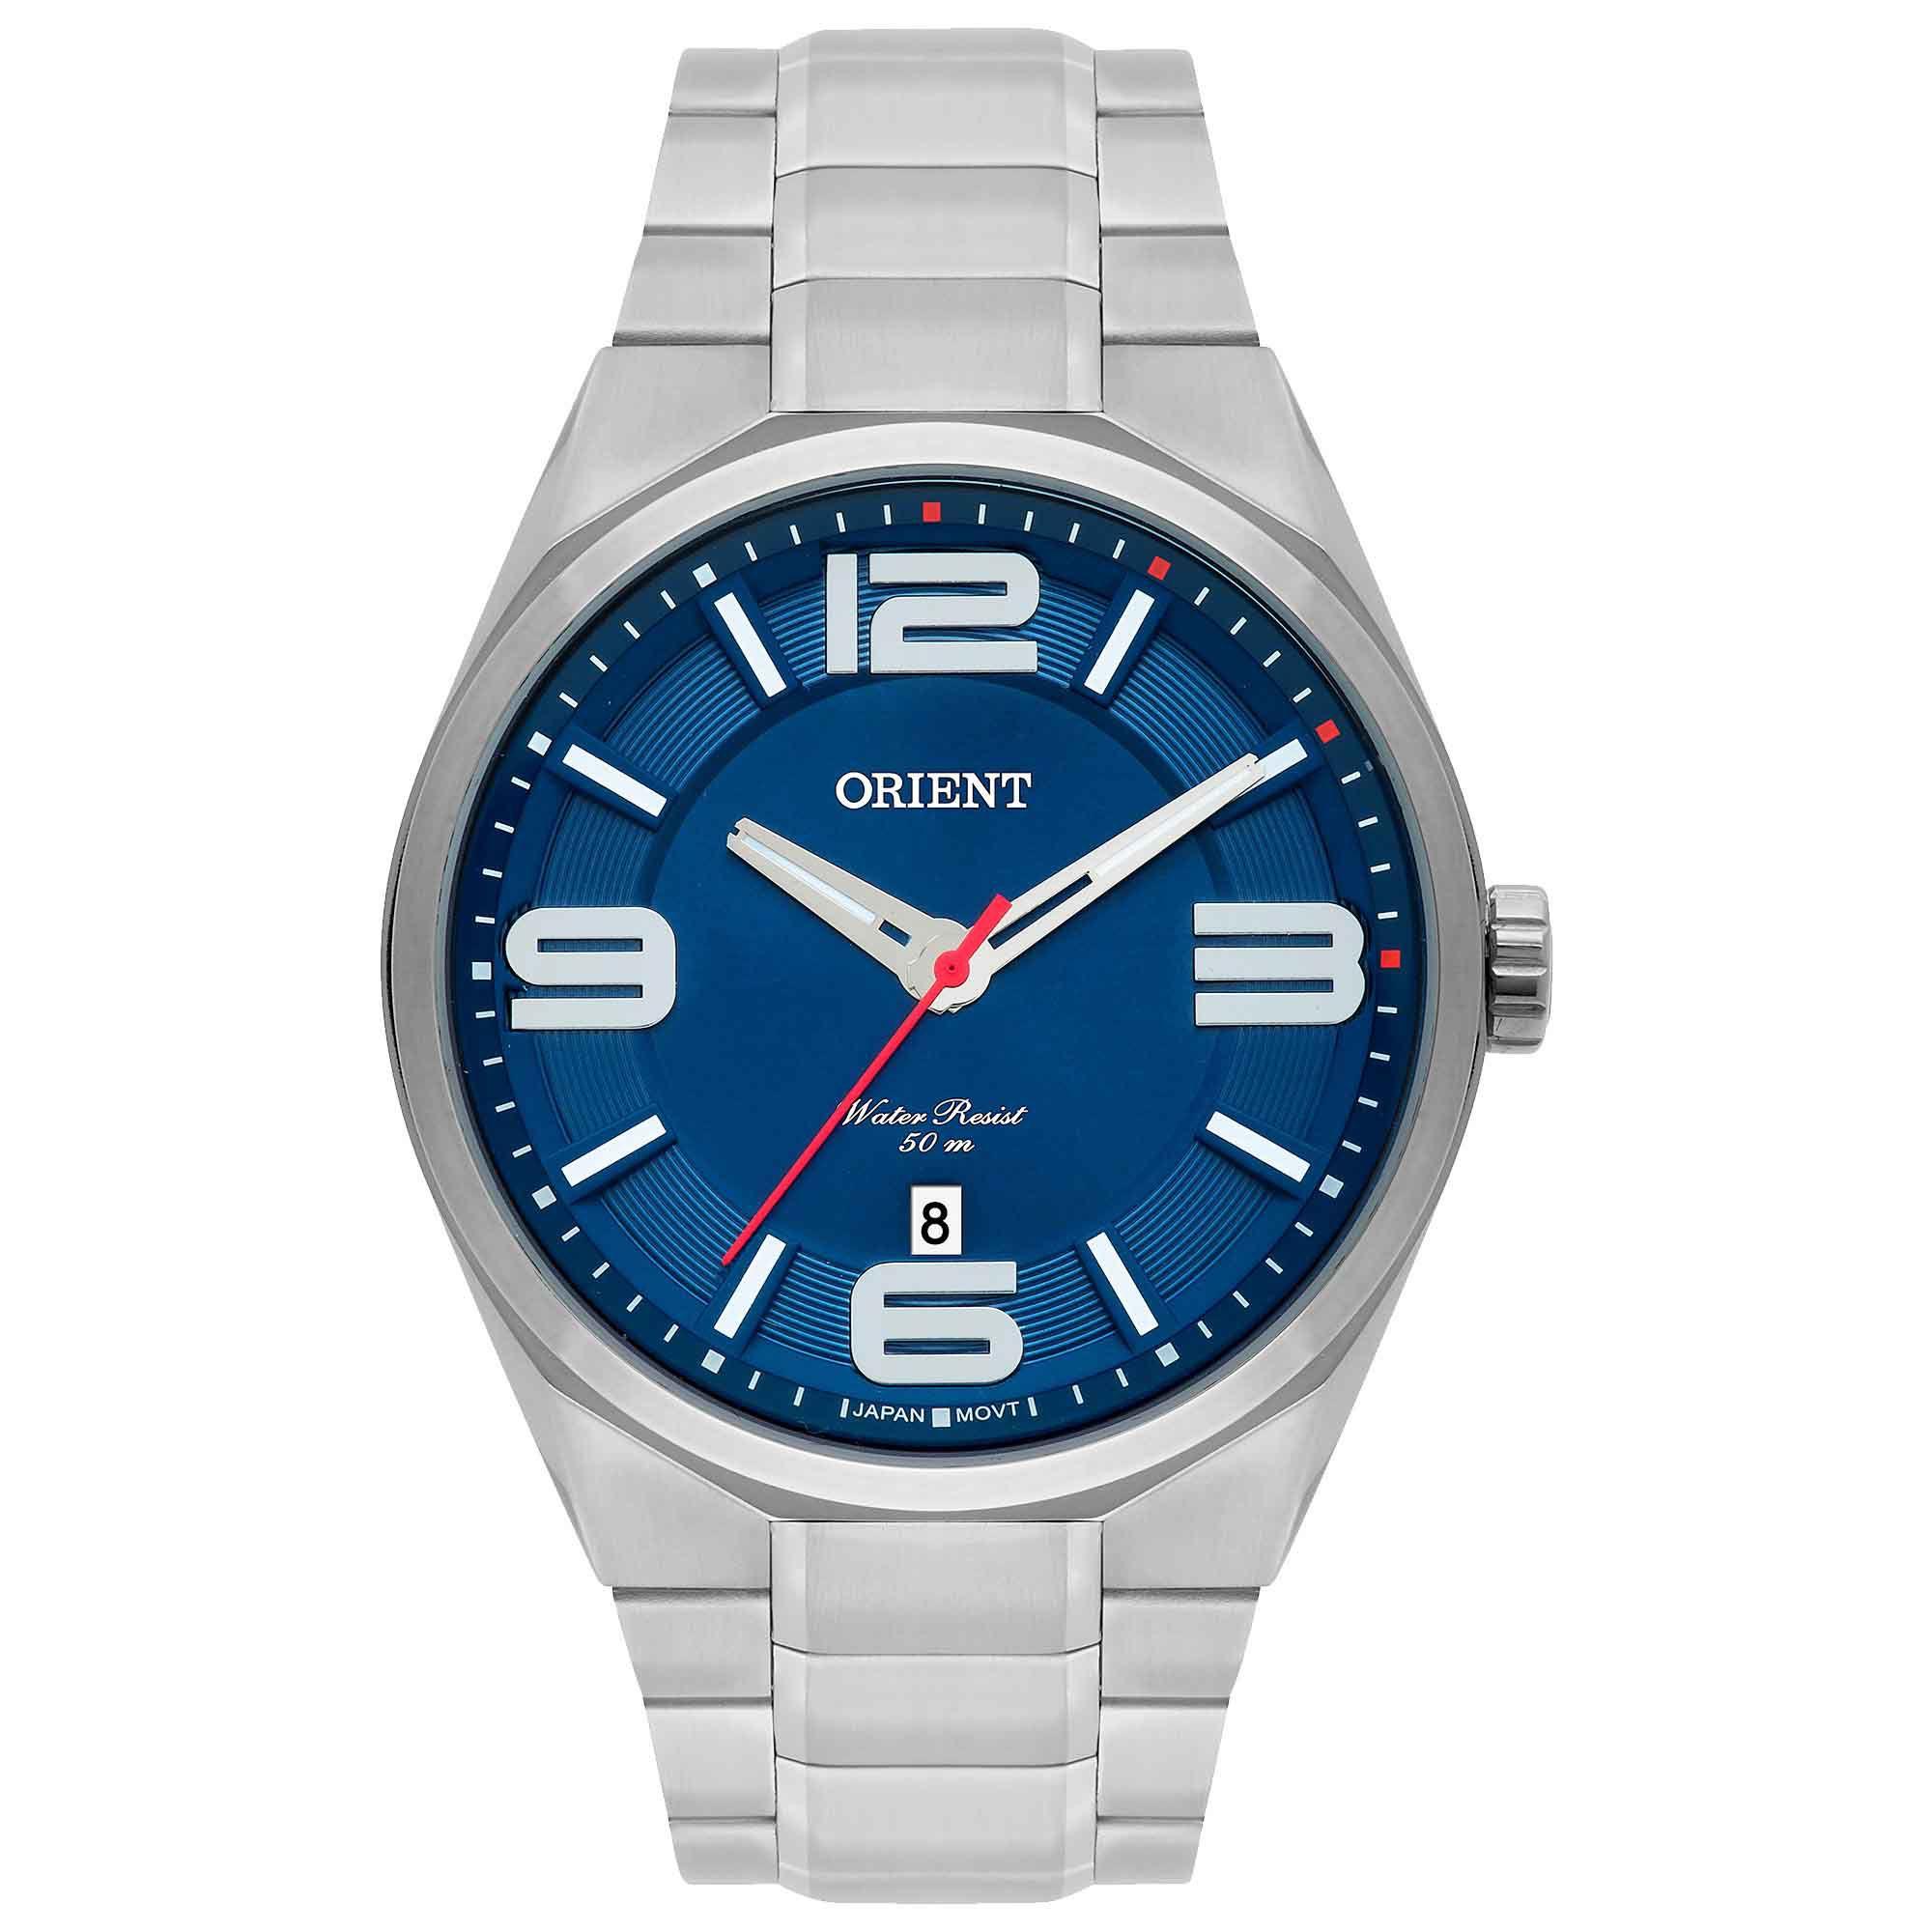 Relógio Masculino Orient MBSS1326 D2SX